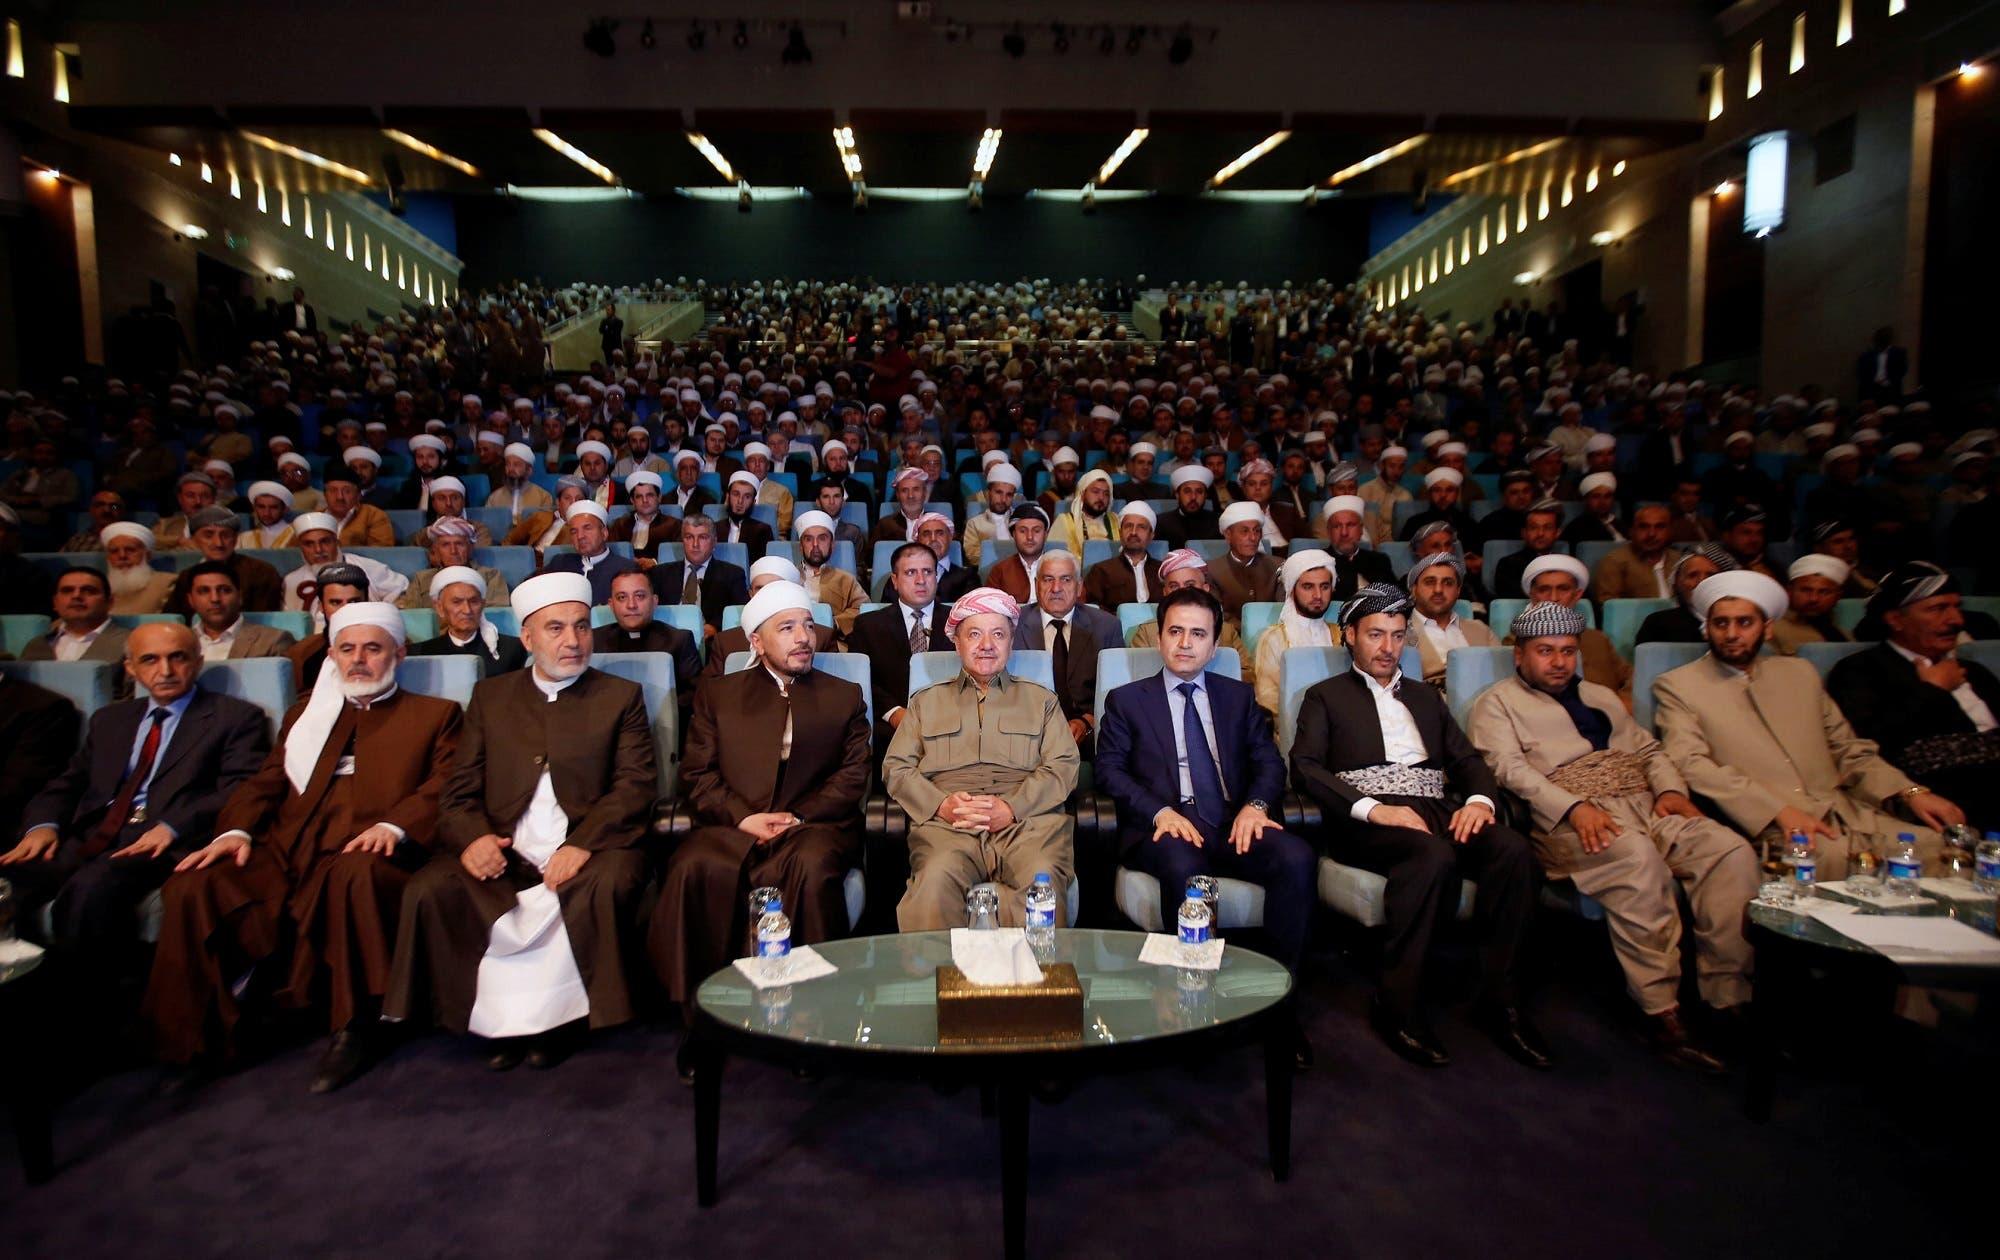 Iraq's Kurdistan region's President Massoud Barzani (C) with clerics and elders from the cities of the Kurdistan region in Erbil, Iraq, August 9, 2017. (Reuters)